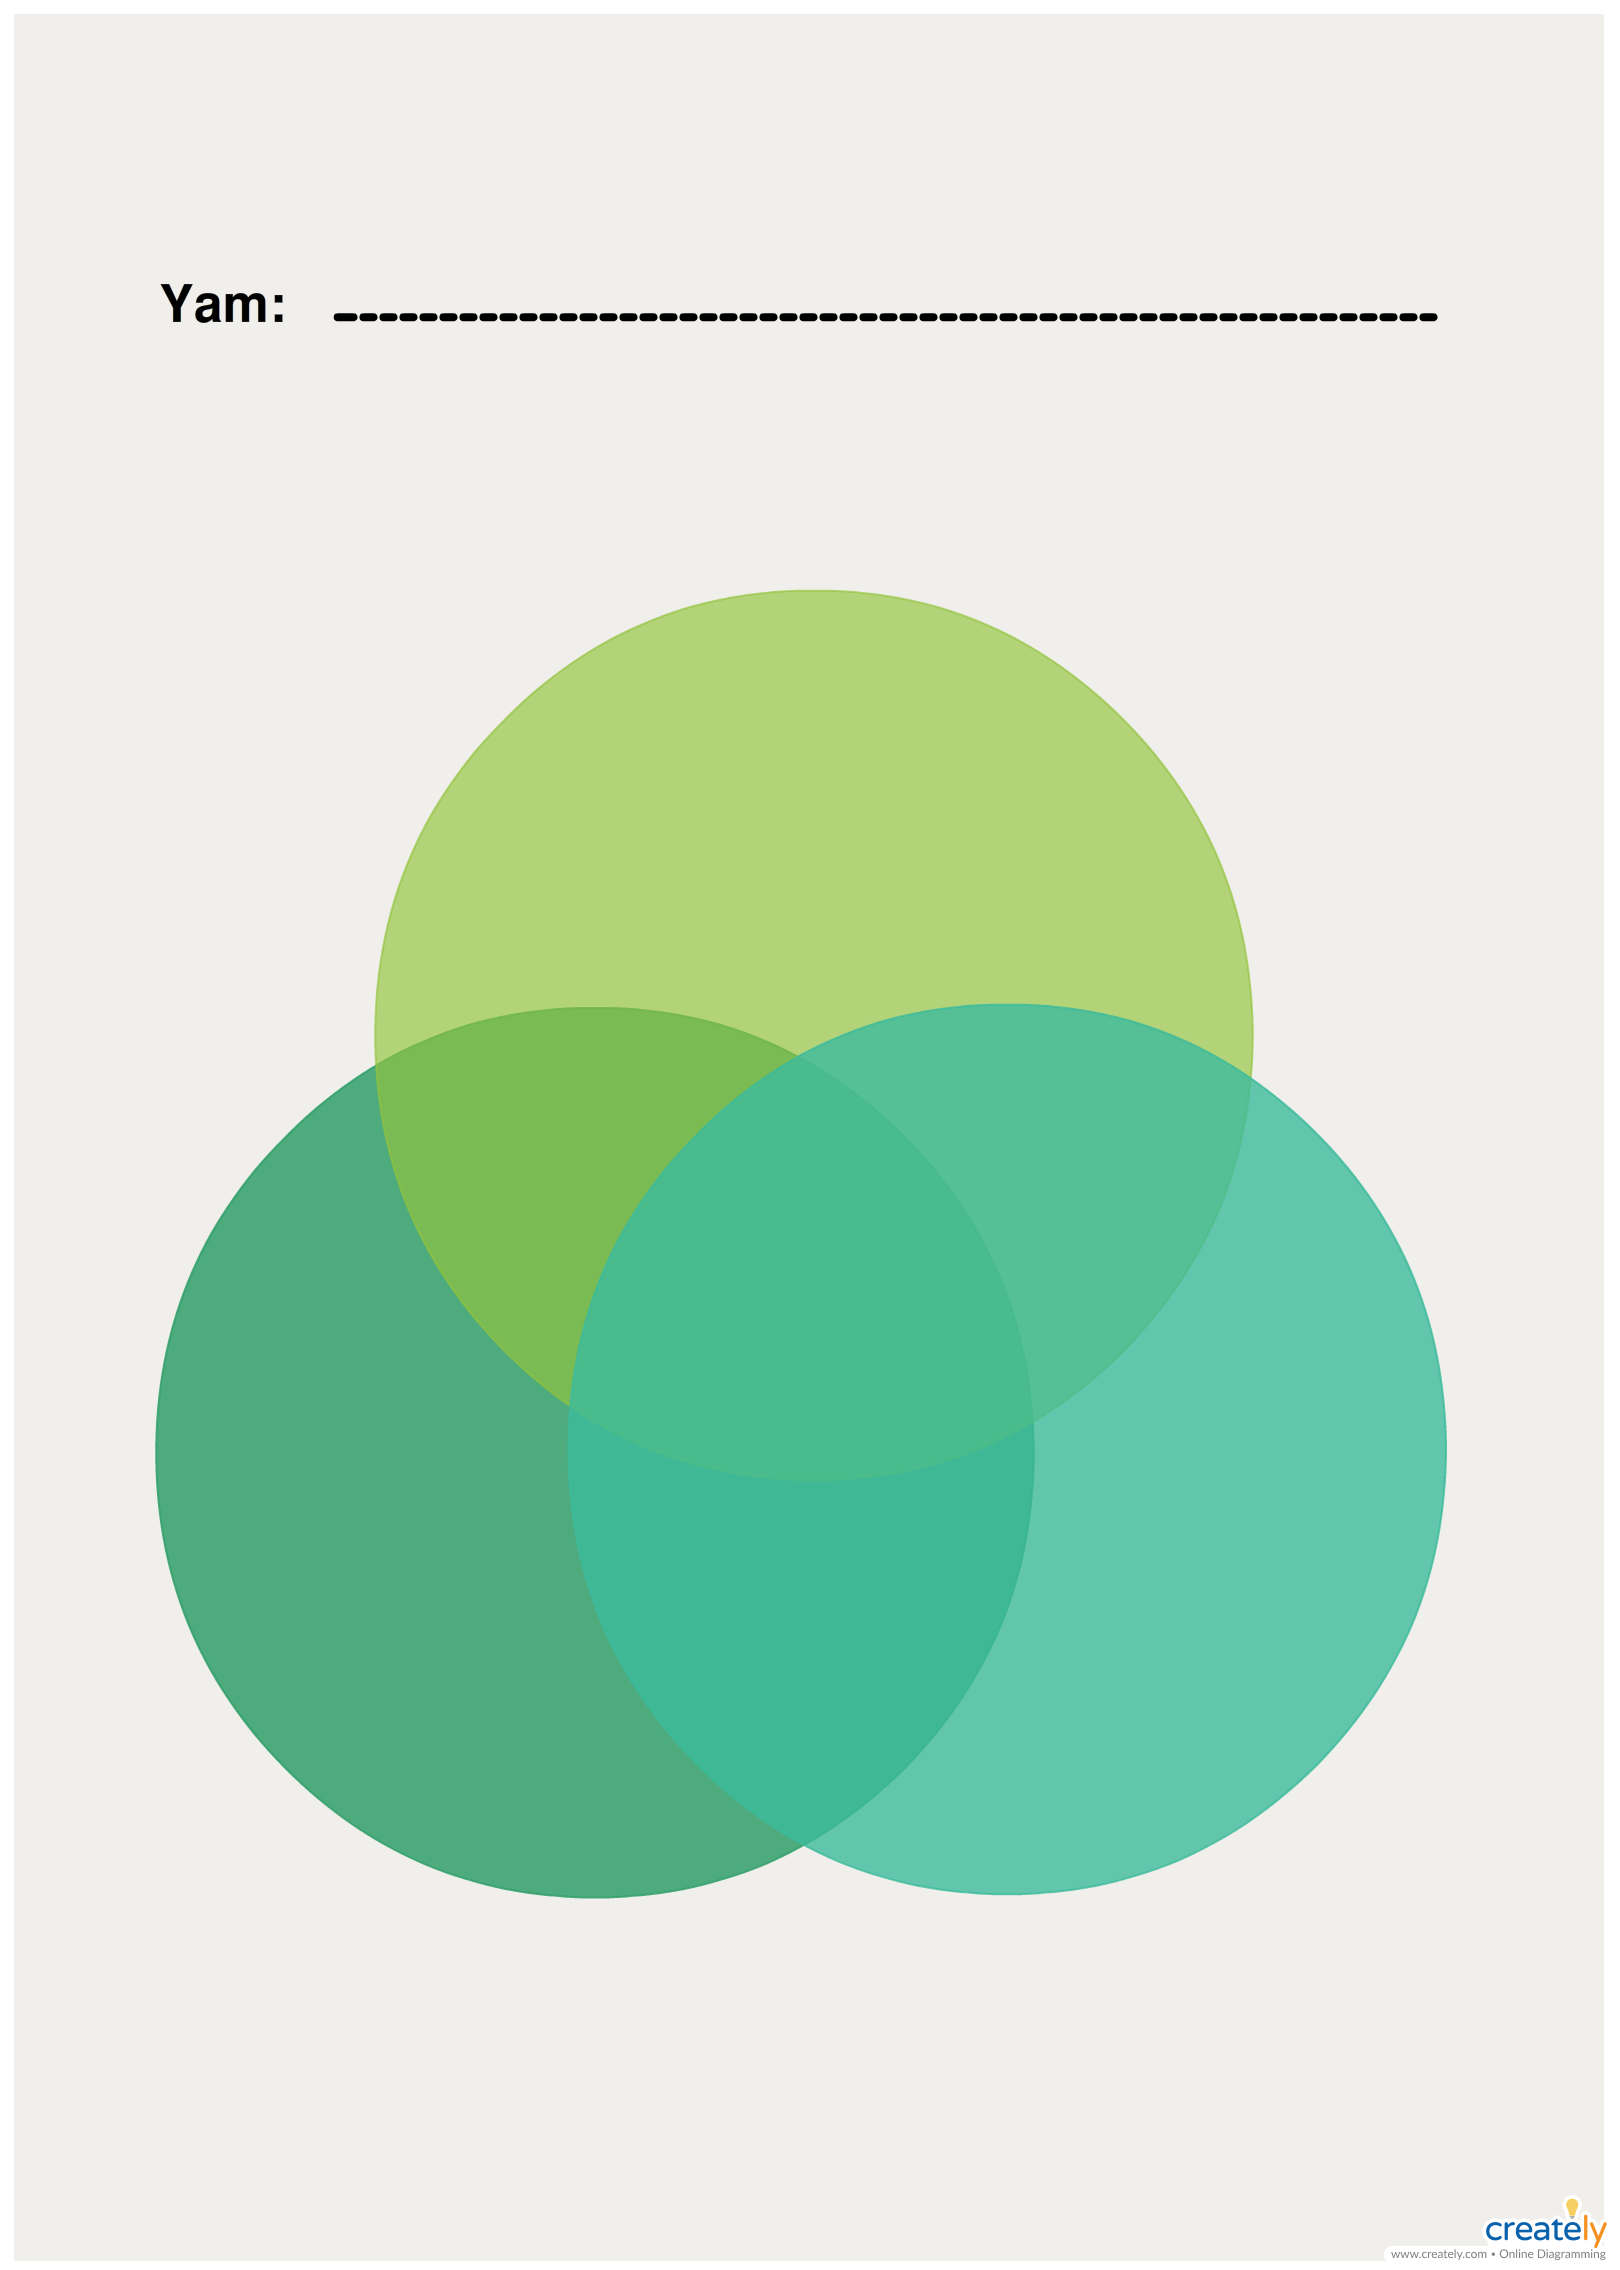 small resolution of blank 3 set de diagrama venn listo para imprimir para hoja a4 puedes editar esta